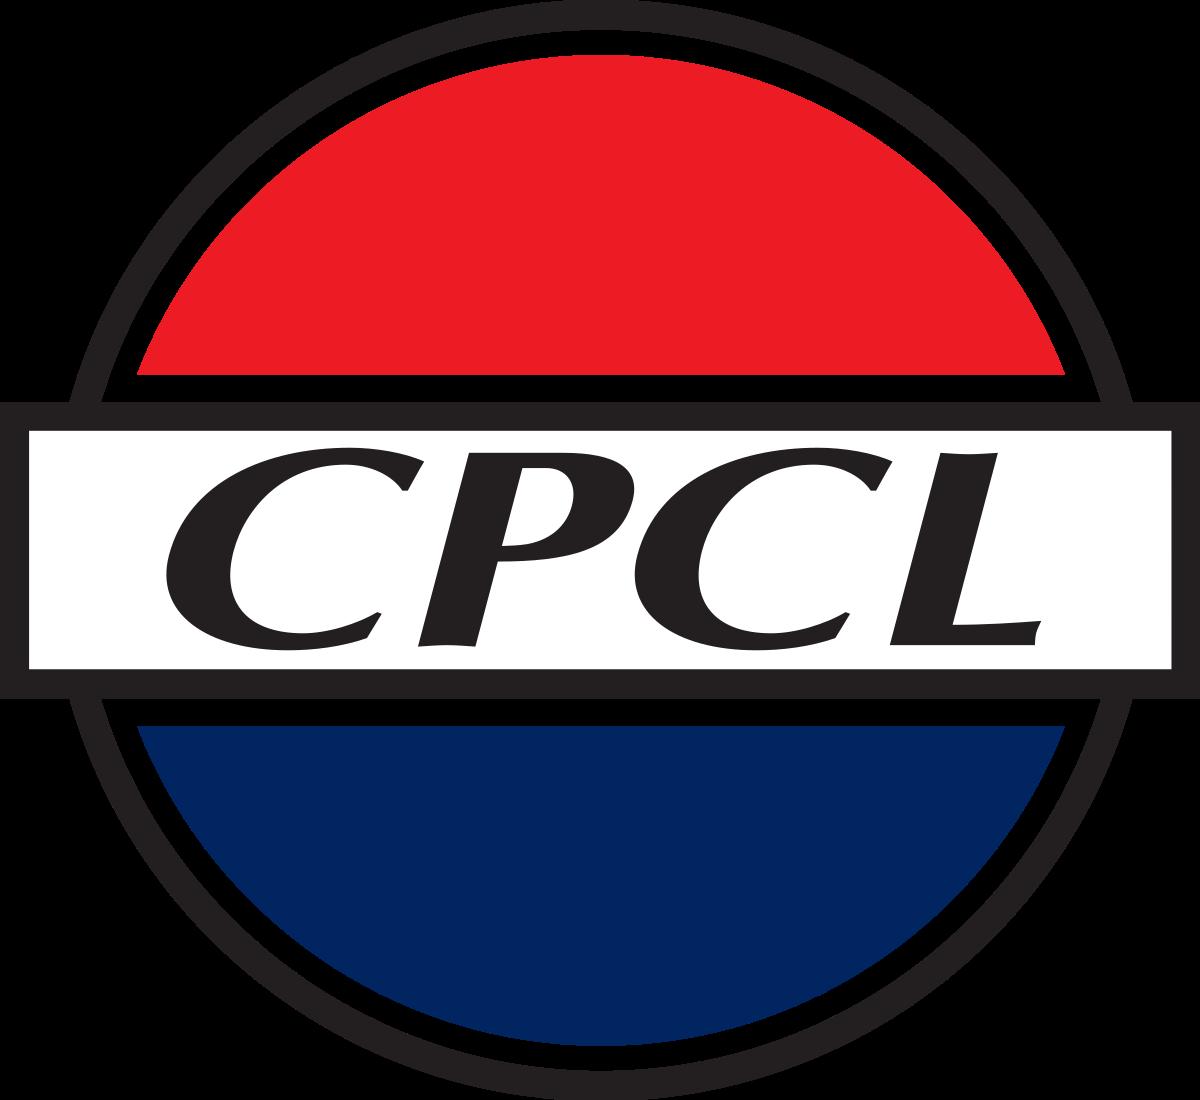 Chennai Petroleum Corp Ltd Image